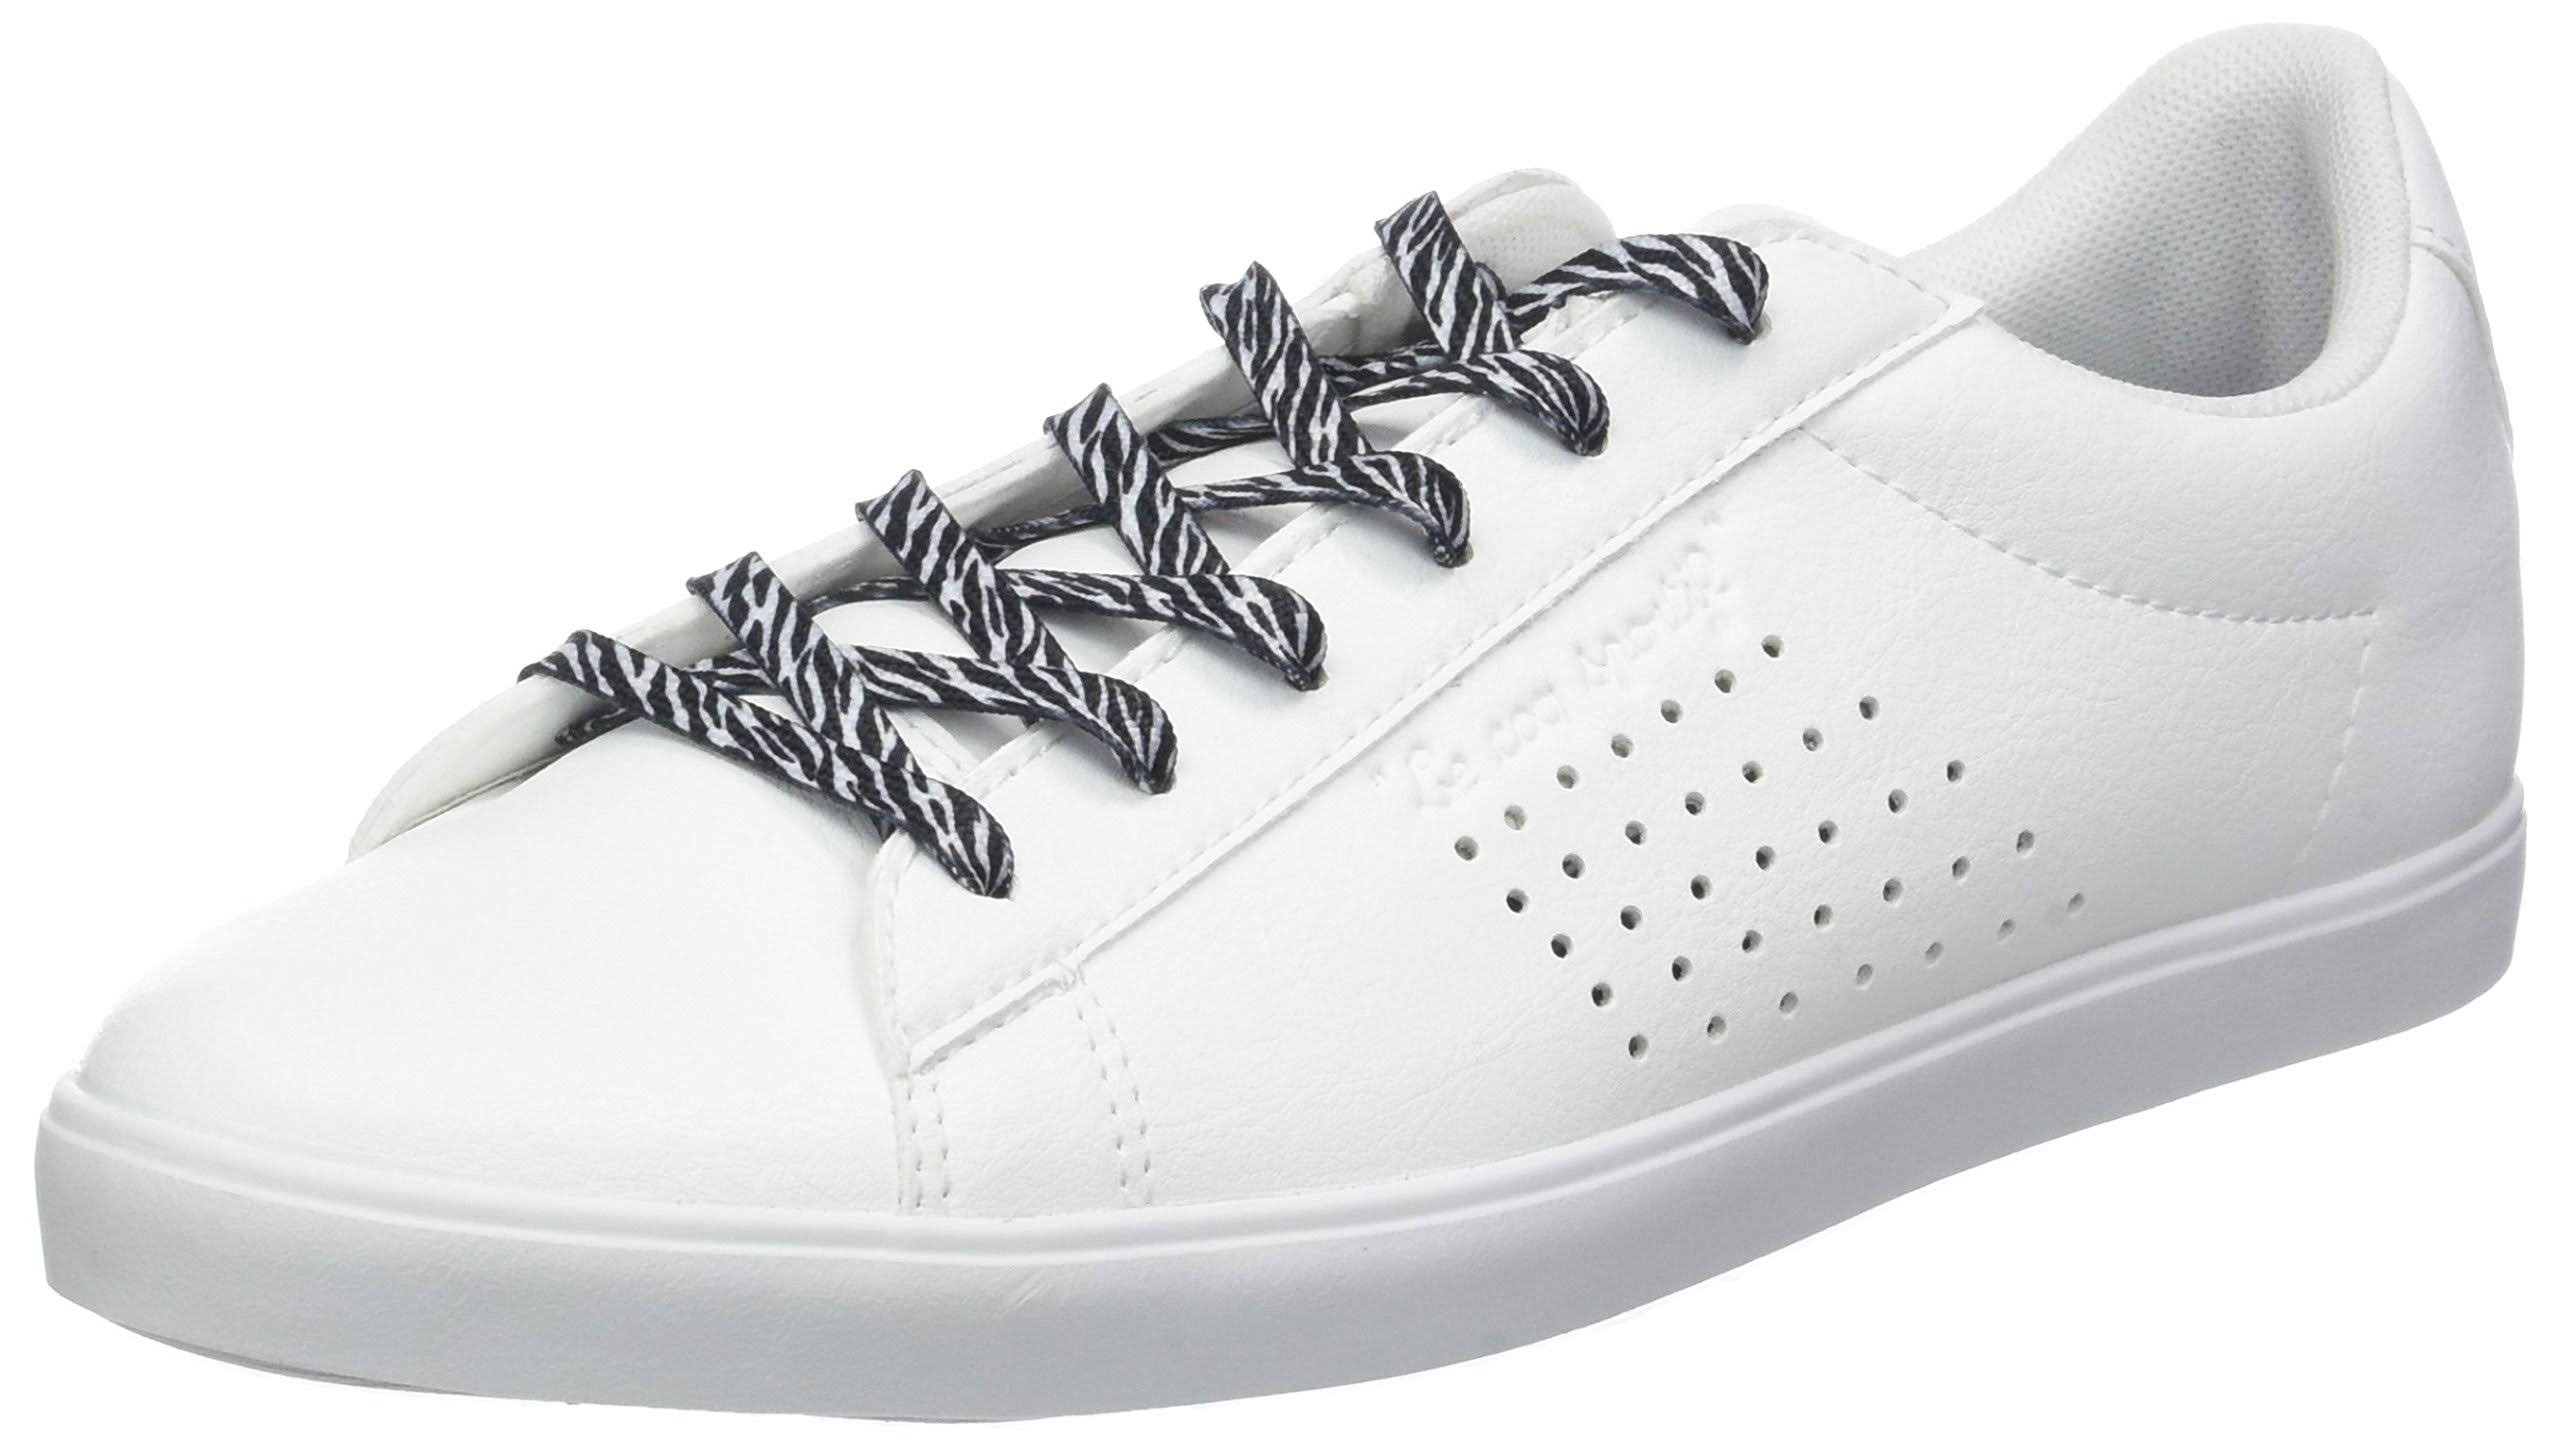 Le Animal Agate Sneakers Damen 40 Weiß Weiss Coq Sportif Grösse HprqwxHR